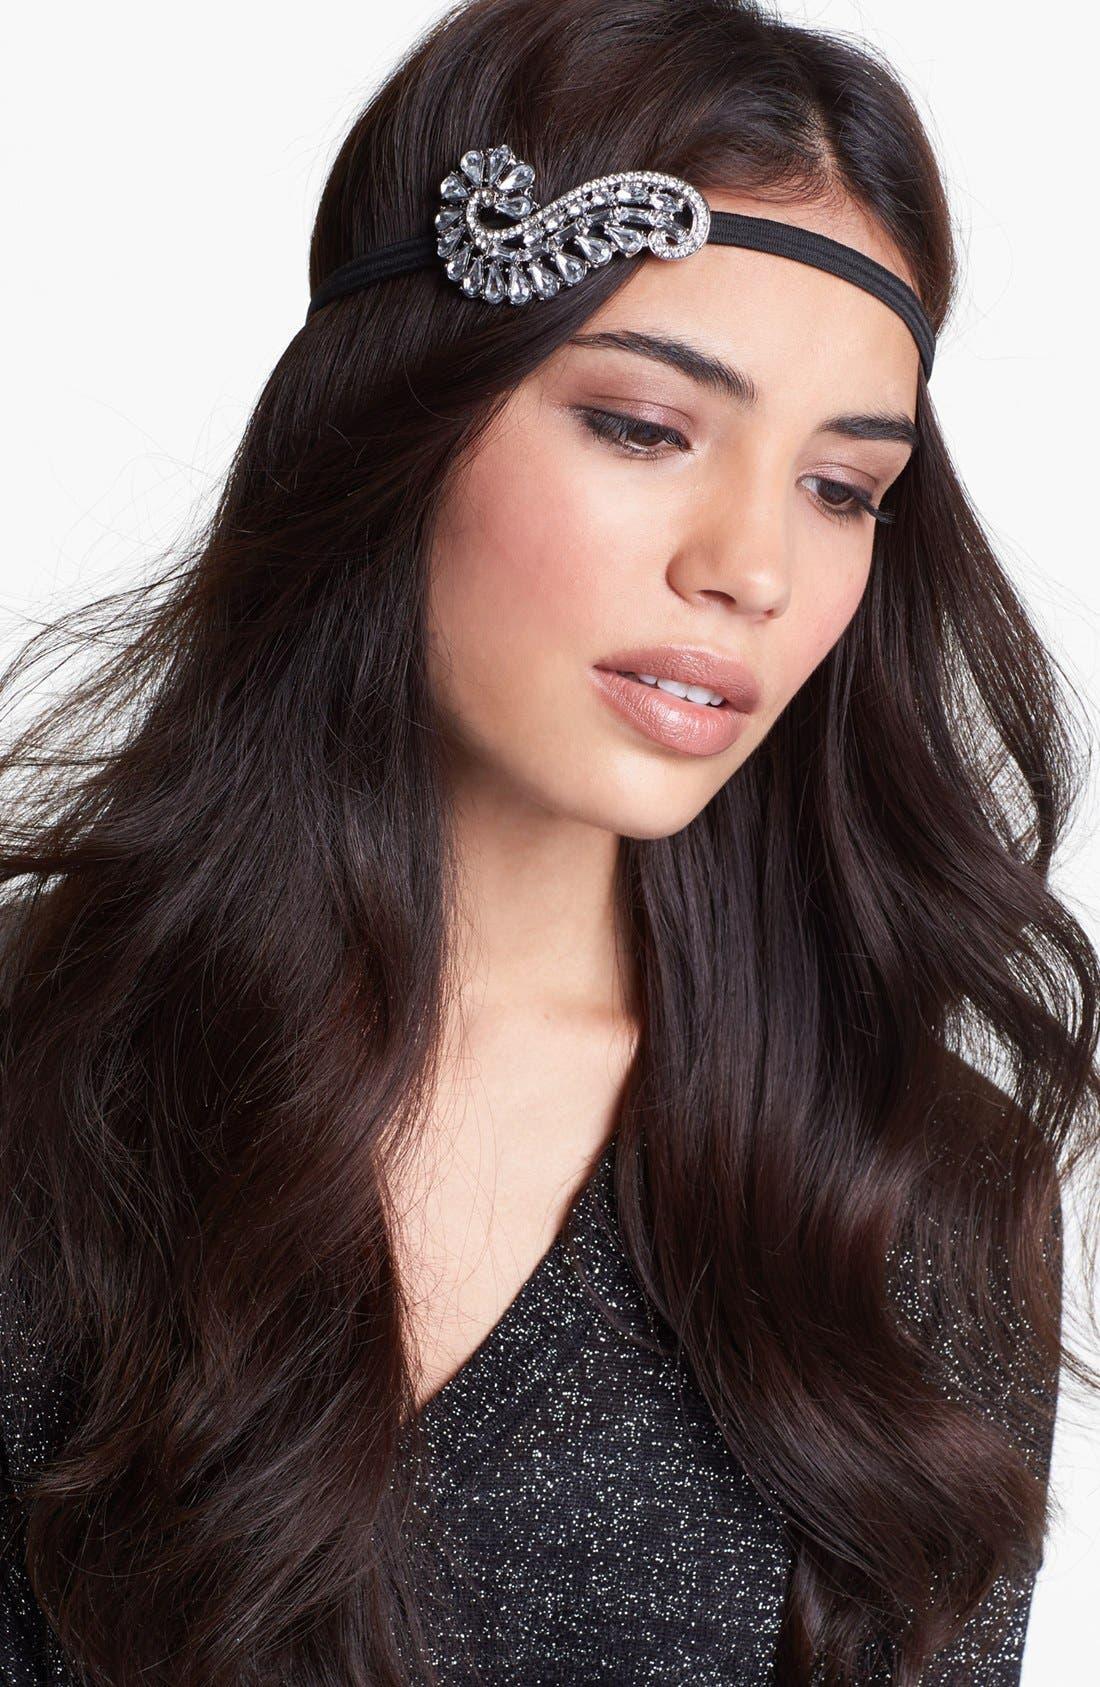 Alternate Image 1 Selected - Cara 'Virginia' Crystal Head Wrap